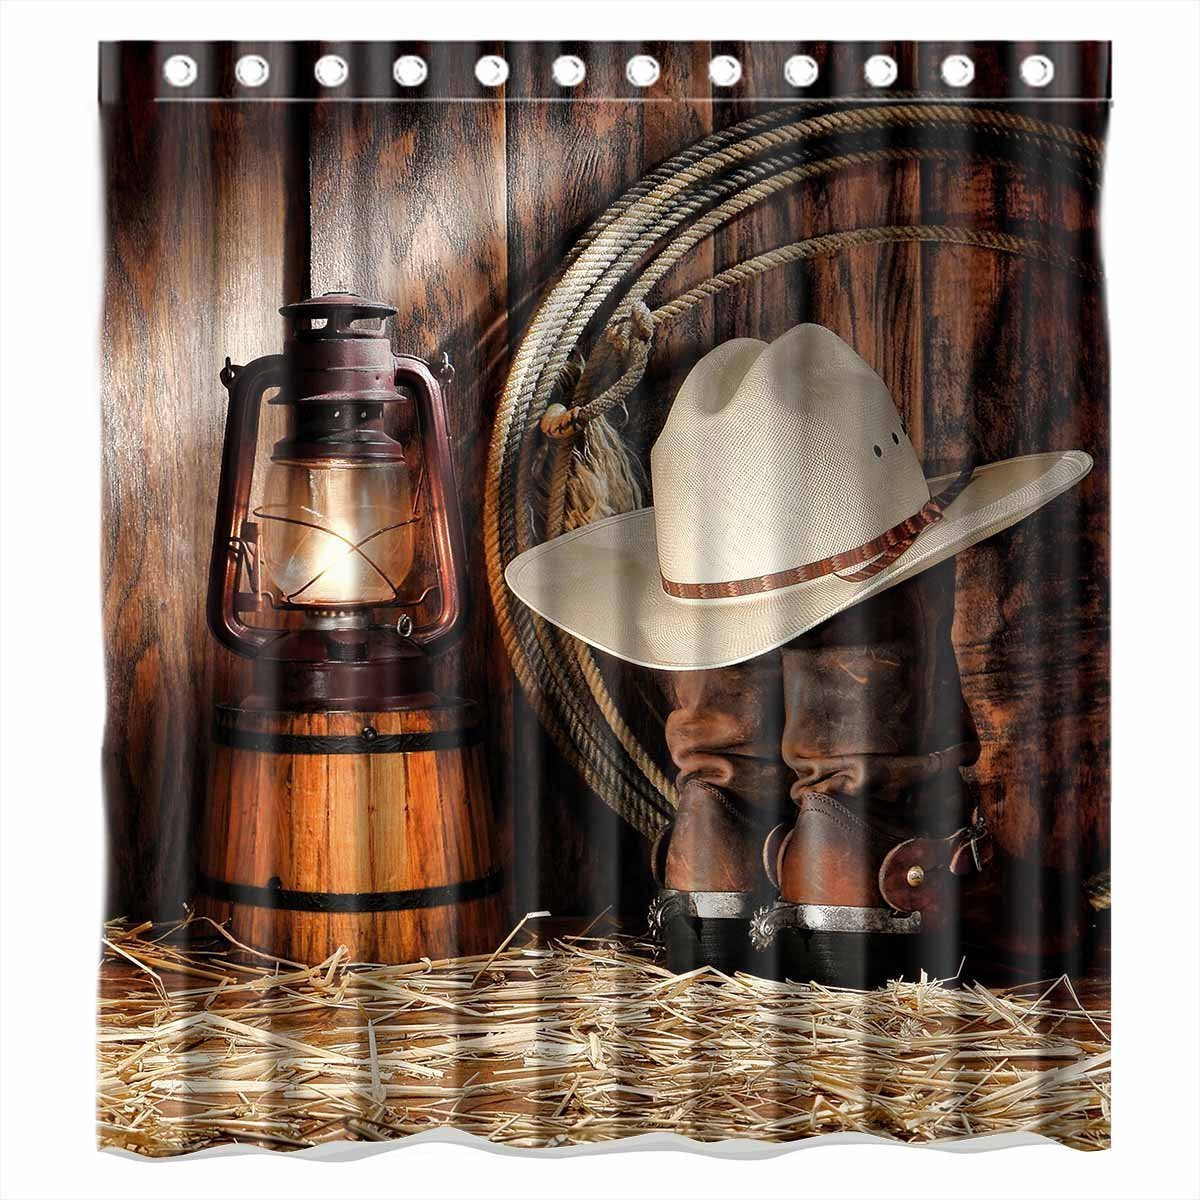 Custom American West Rodeo Cowboy Waterproof Polyester Fabric Bathroom Shower Curtain Standard Size 66(w)x72(h) COMIN16JU032710